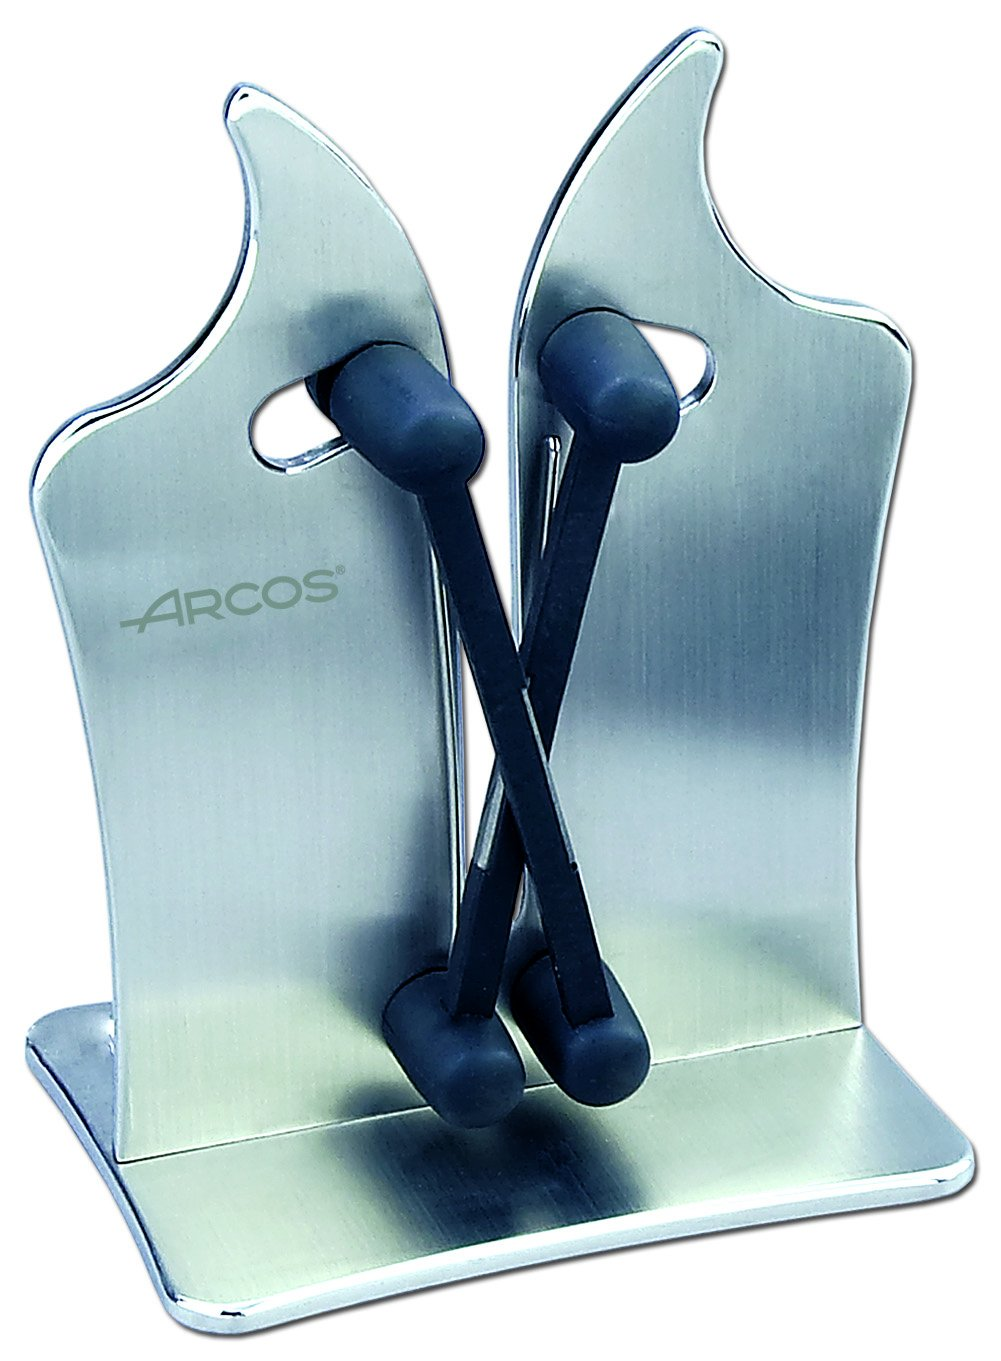 Arcos professional Sharpener, Metallic by ARCOS